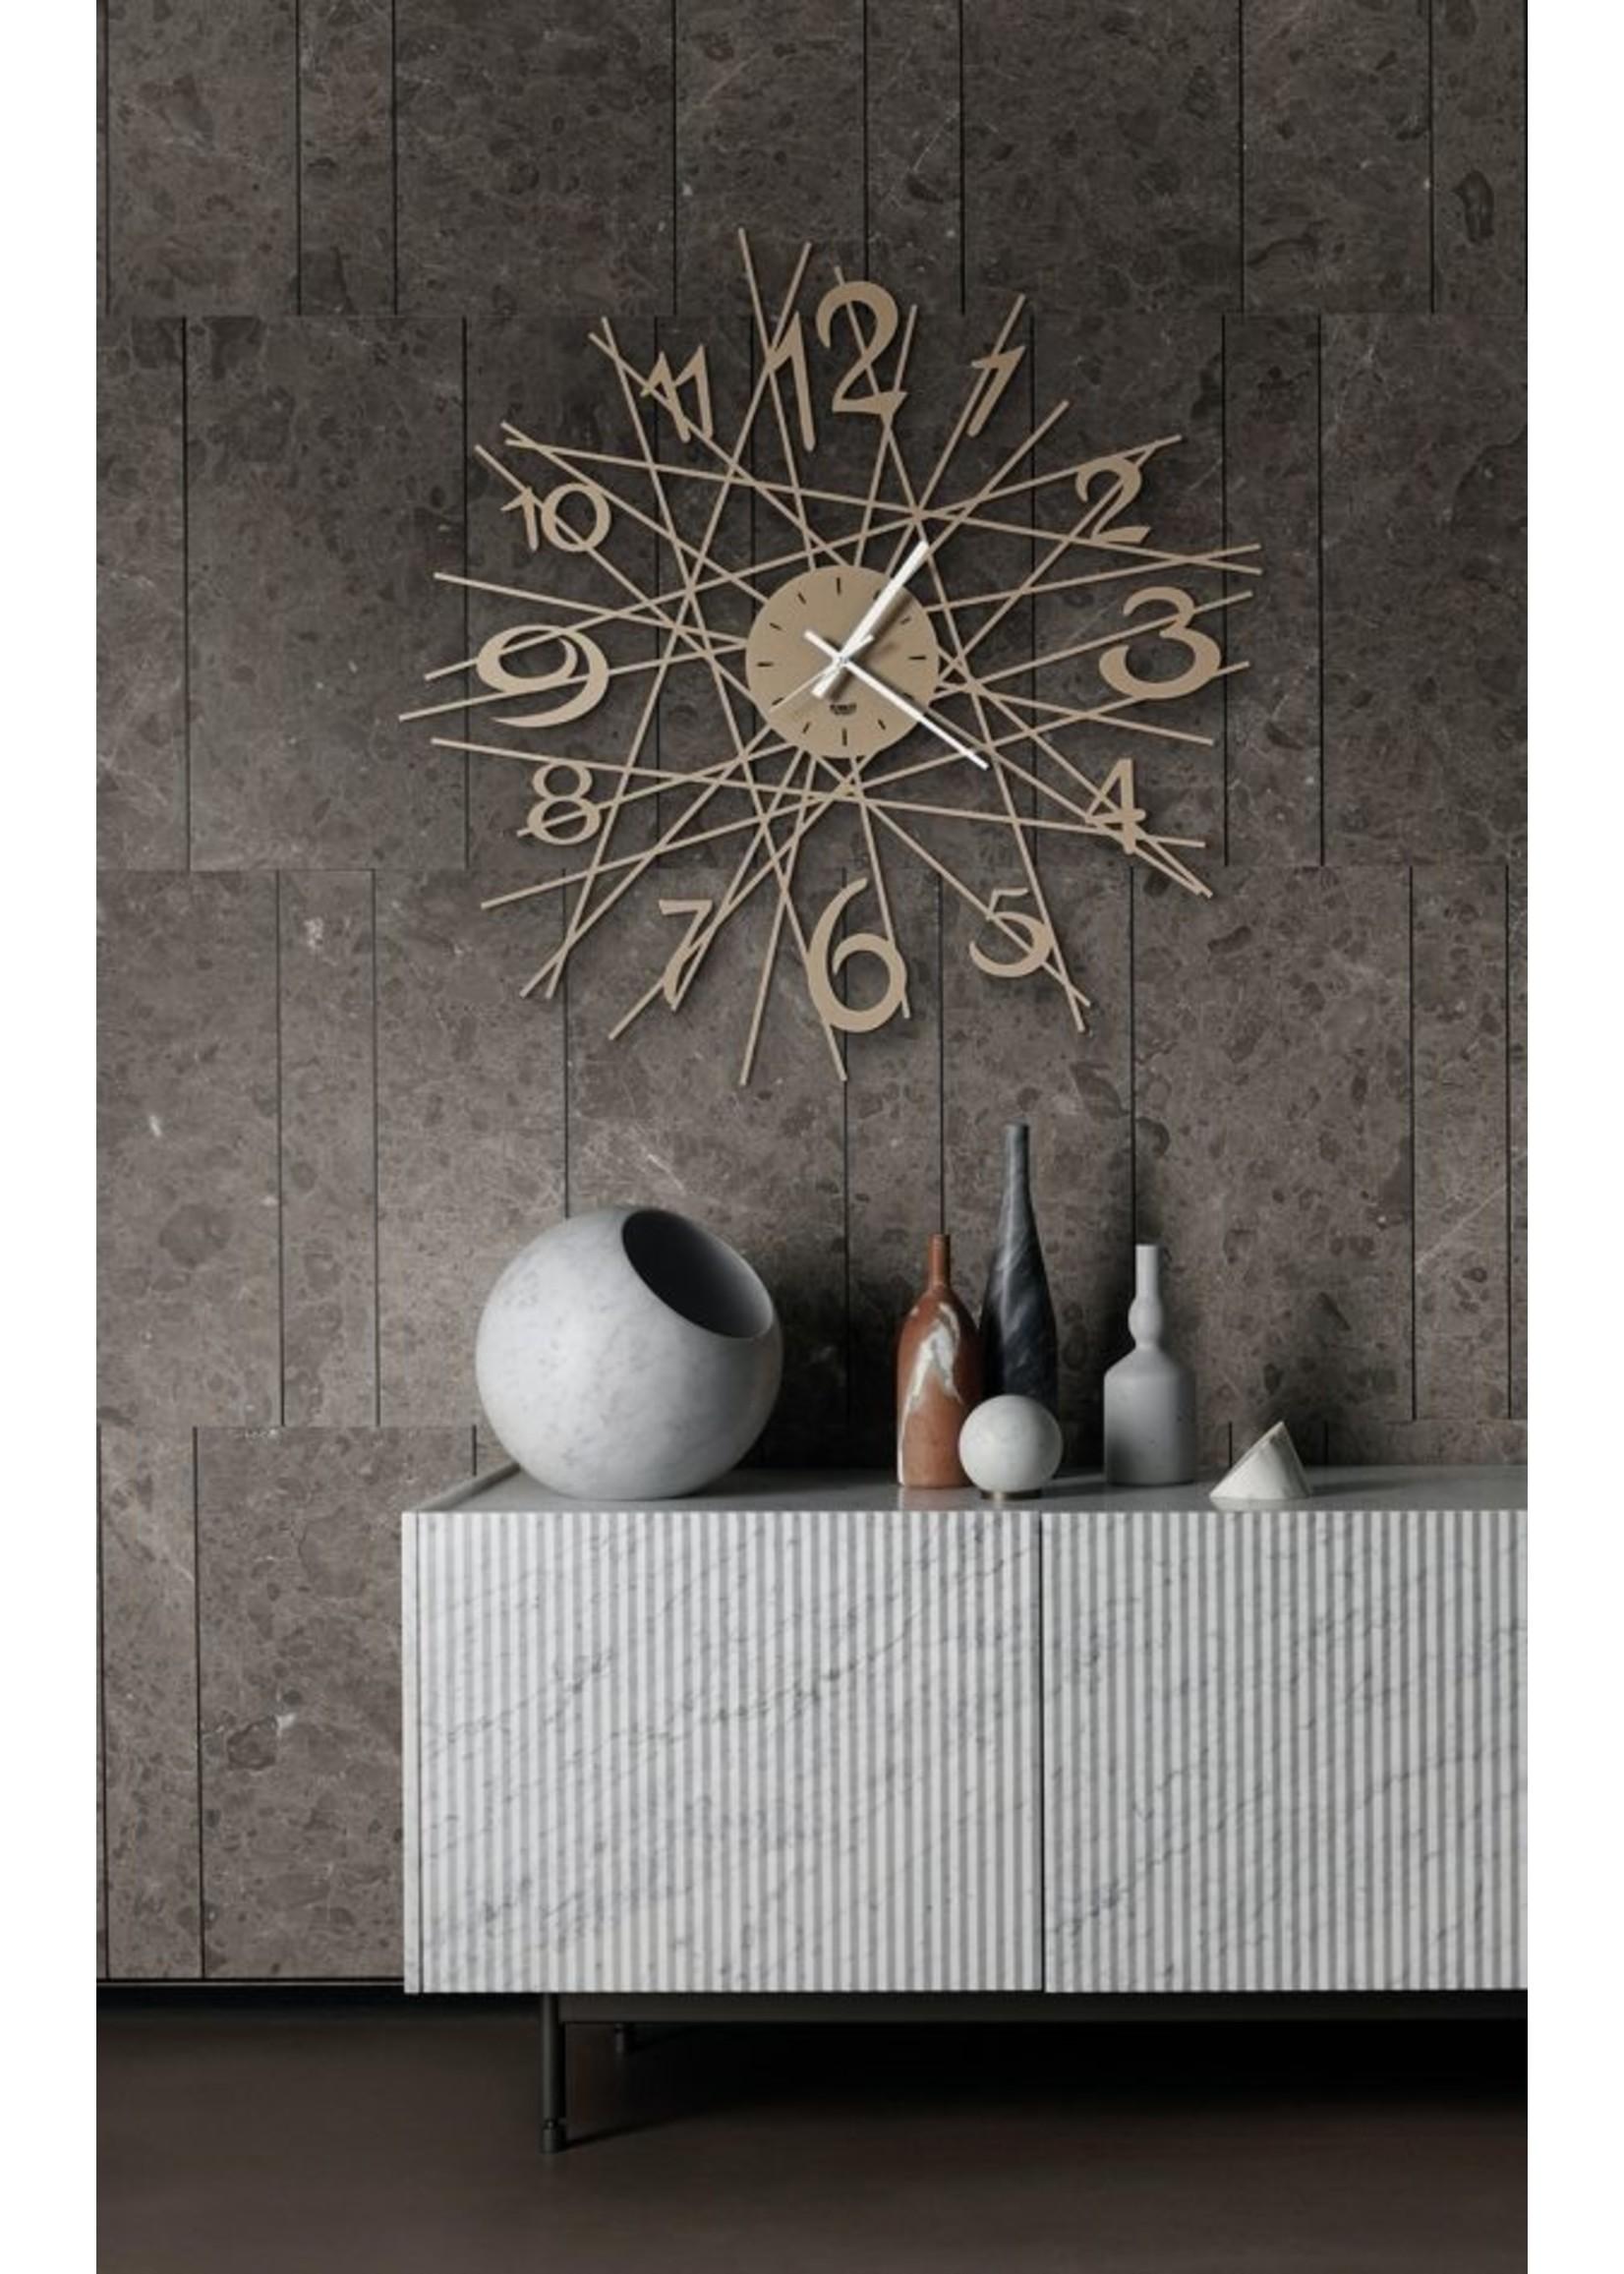 Arti & Mestieri Wandklok Italiaans Design Zig Zag 3513 c71 black